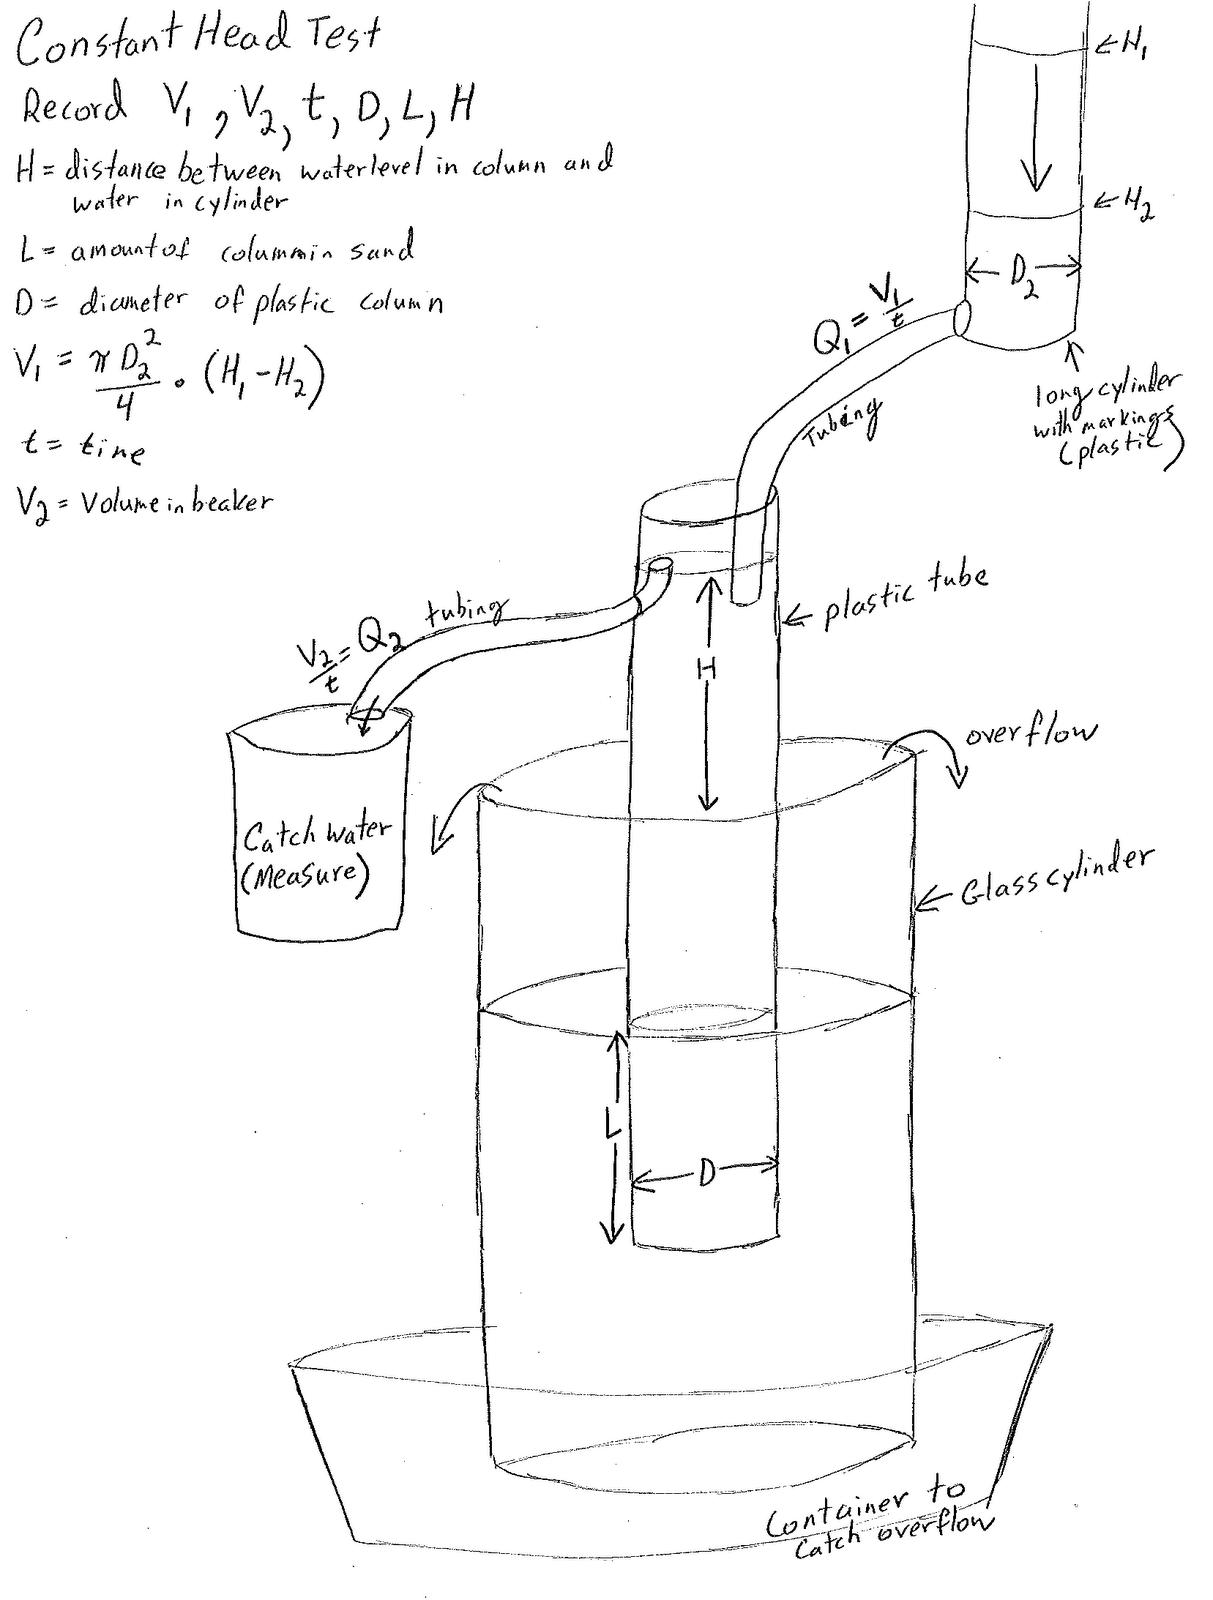 medium resolution of sau hydraulic conductivity 2012 the constant head test